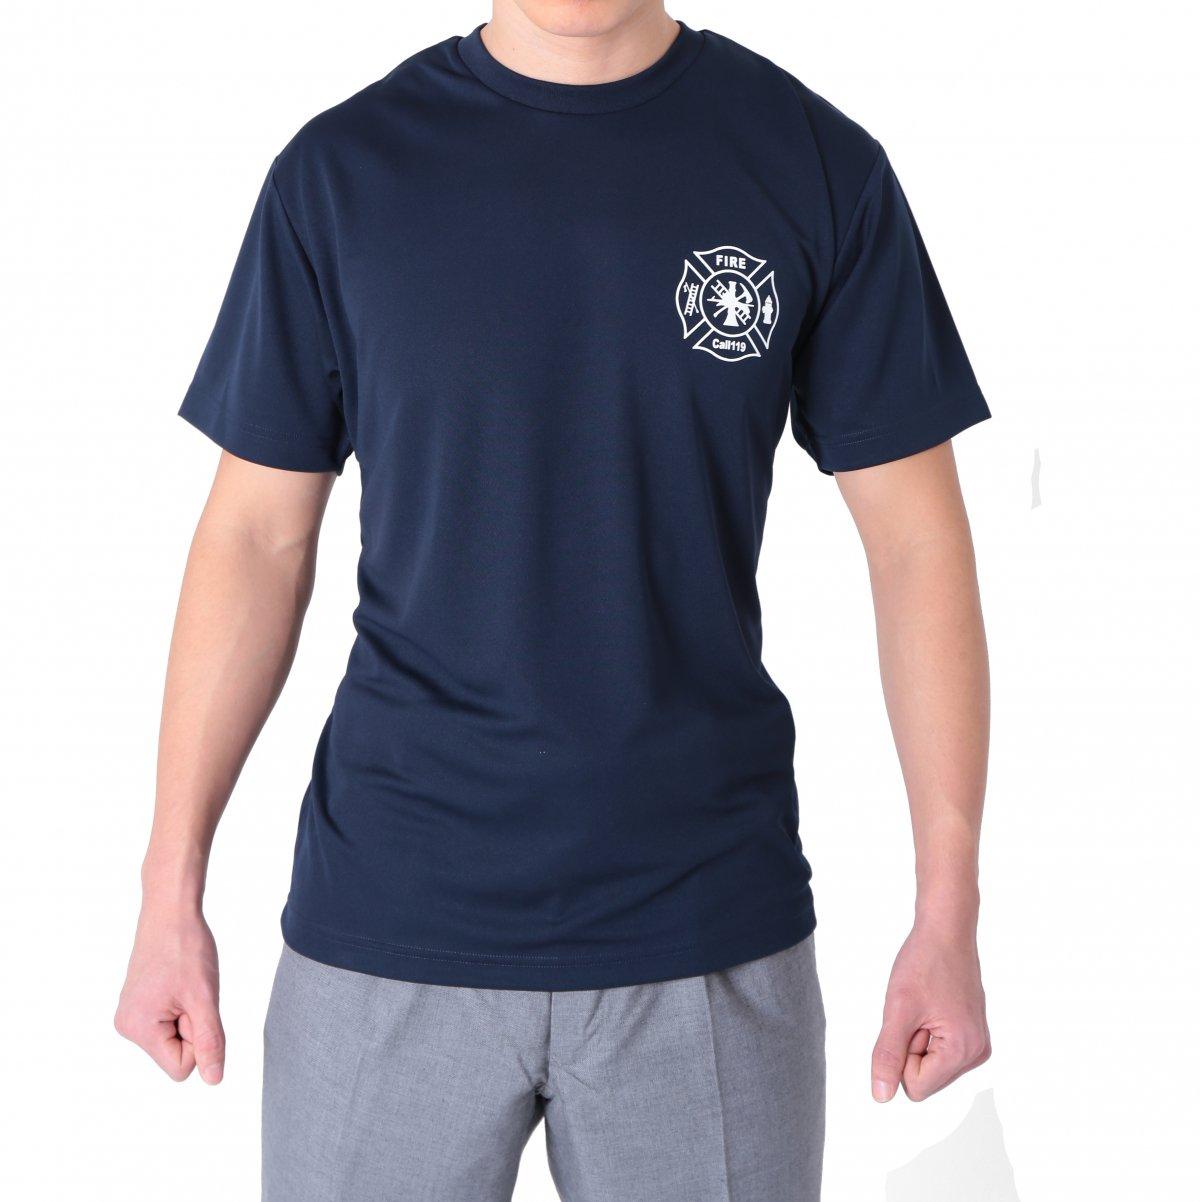 FIRE FIGHTER Call119 デザインTシャツ【画像2】